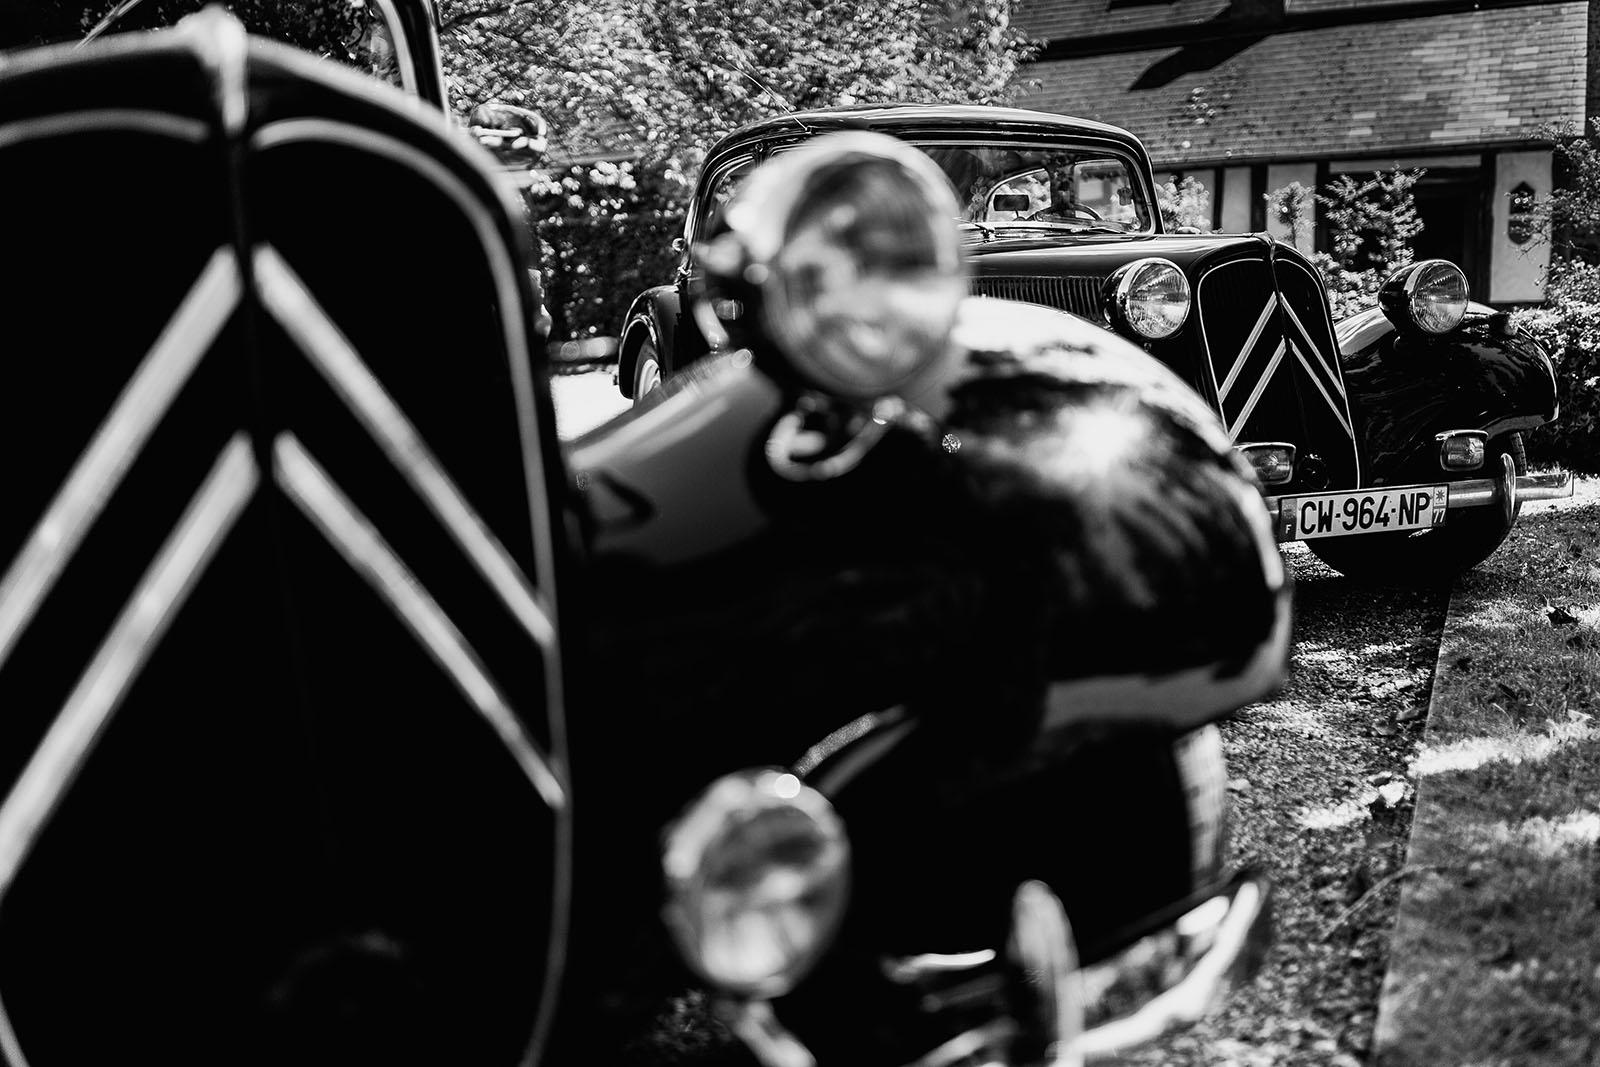 Mariage au Manoir de Corny en Normandie. Les voitures de mariage. Traction